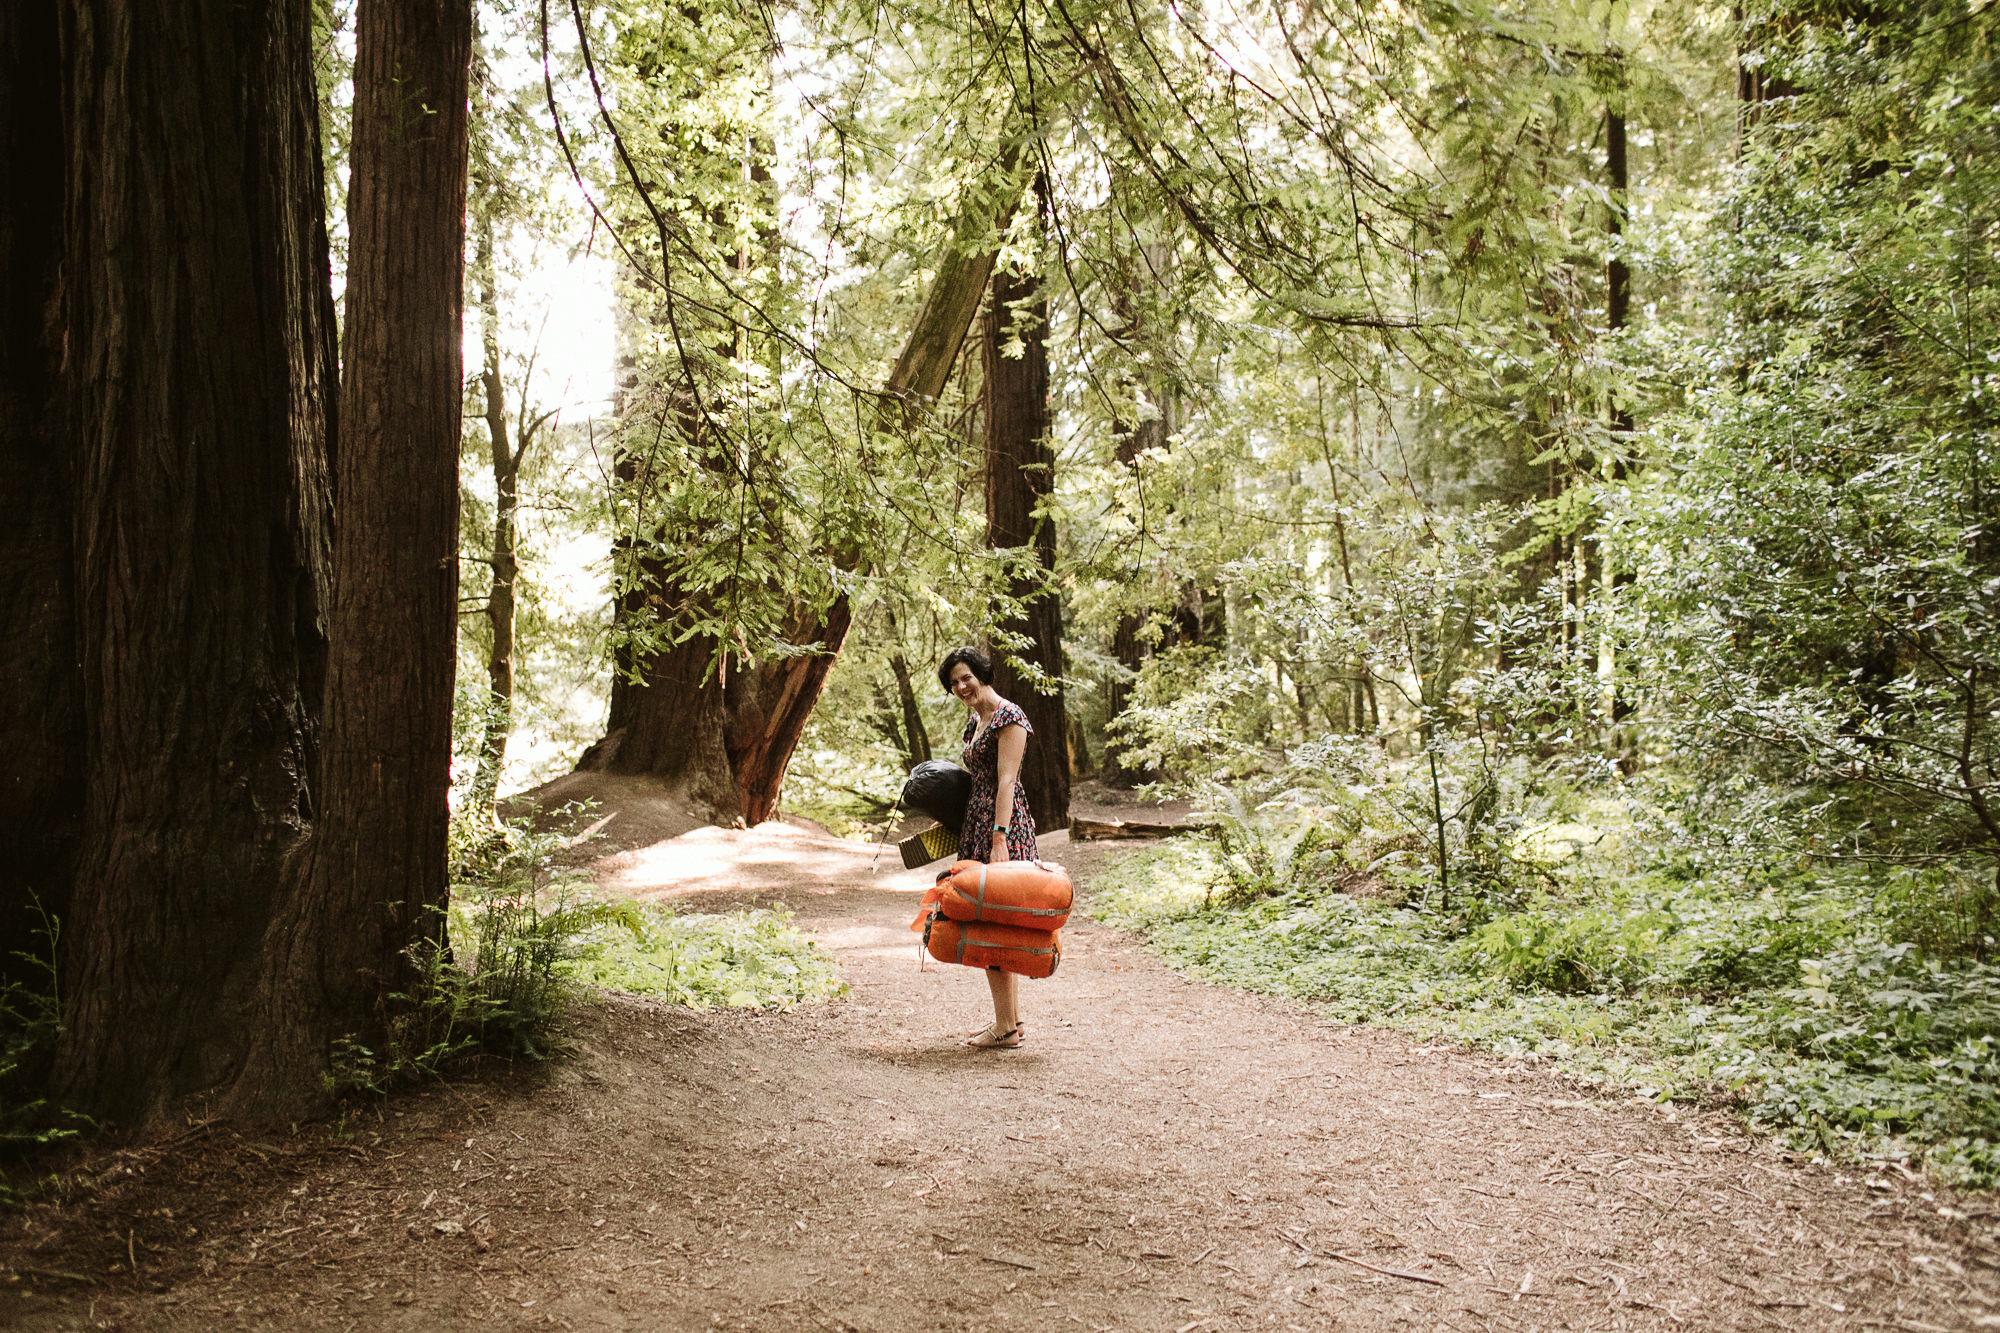 California-wedding-photographer-alfonso-flores-pamplin-groove-12.jpg